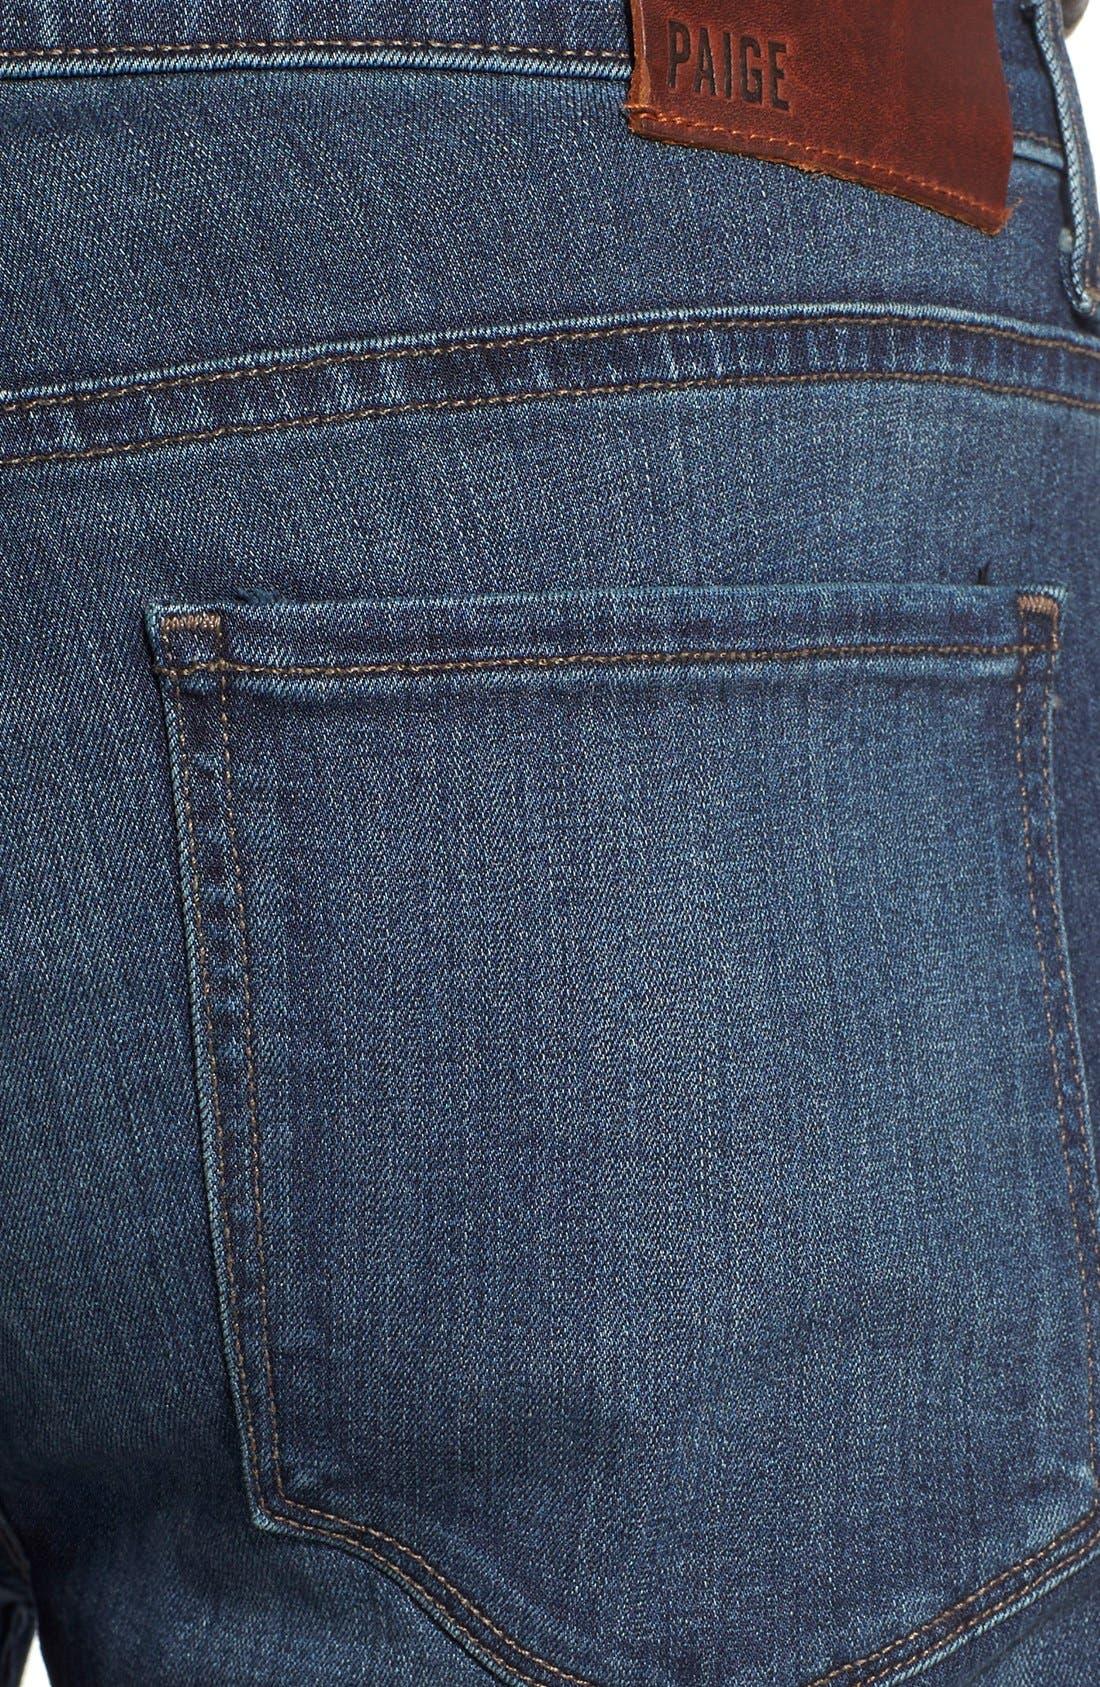 'Federal' Slim Straight Leg Jeans,                             Alternate thumbnail 4, color,                             BLAKELY